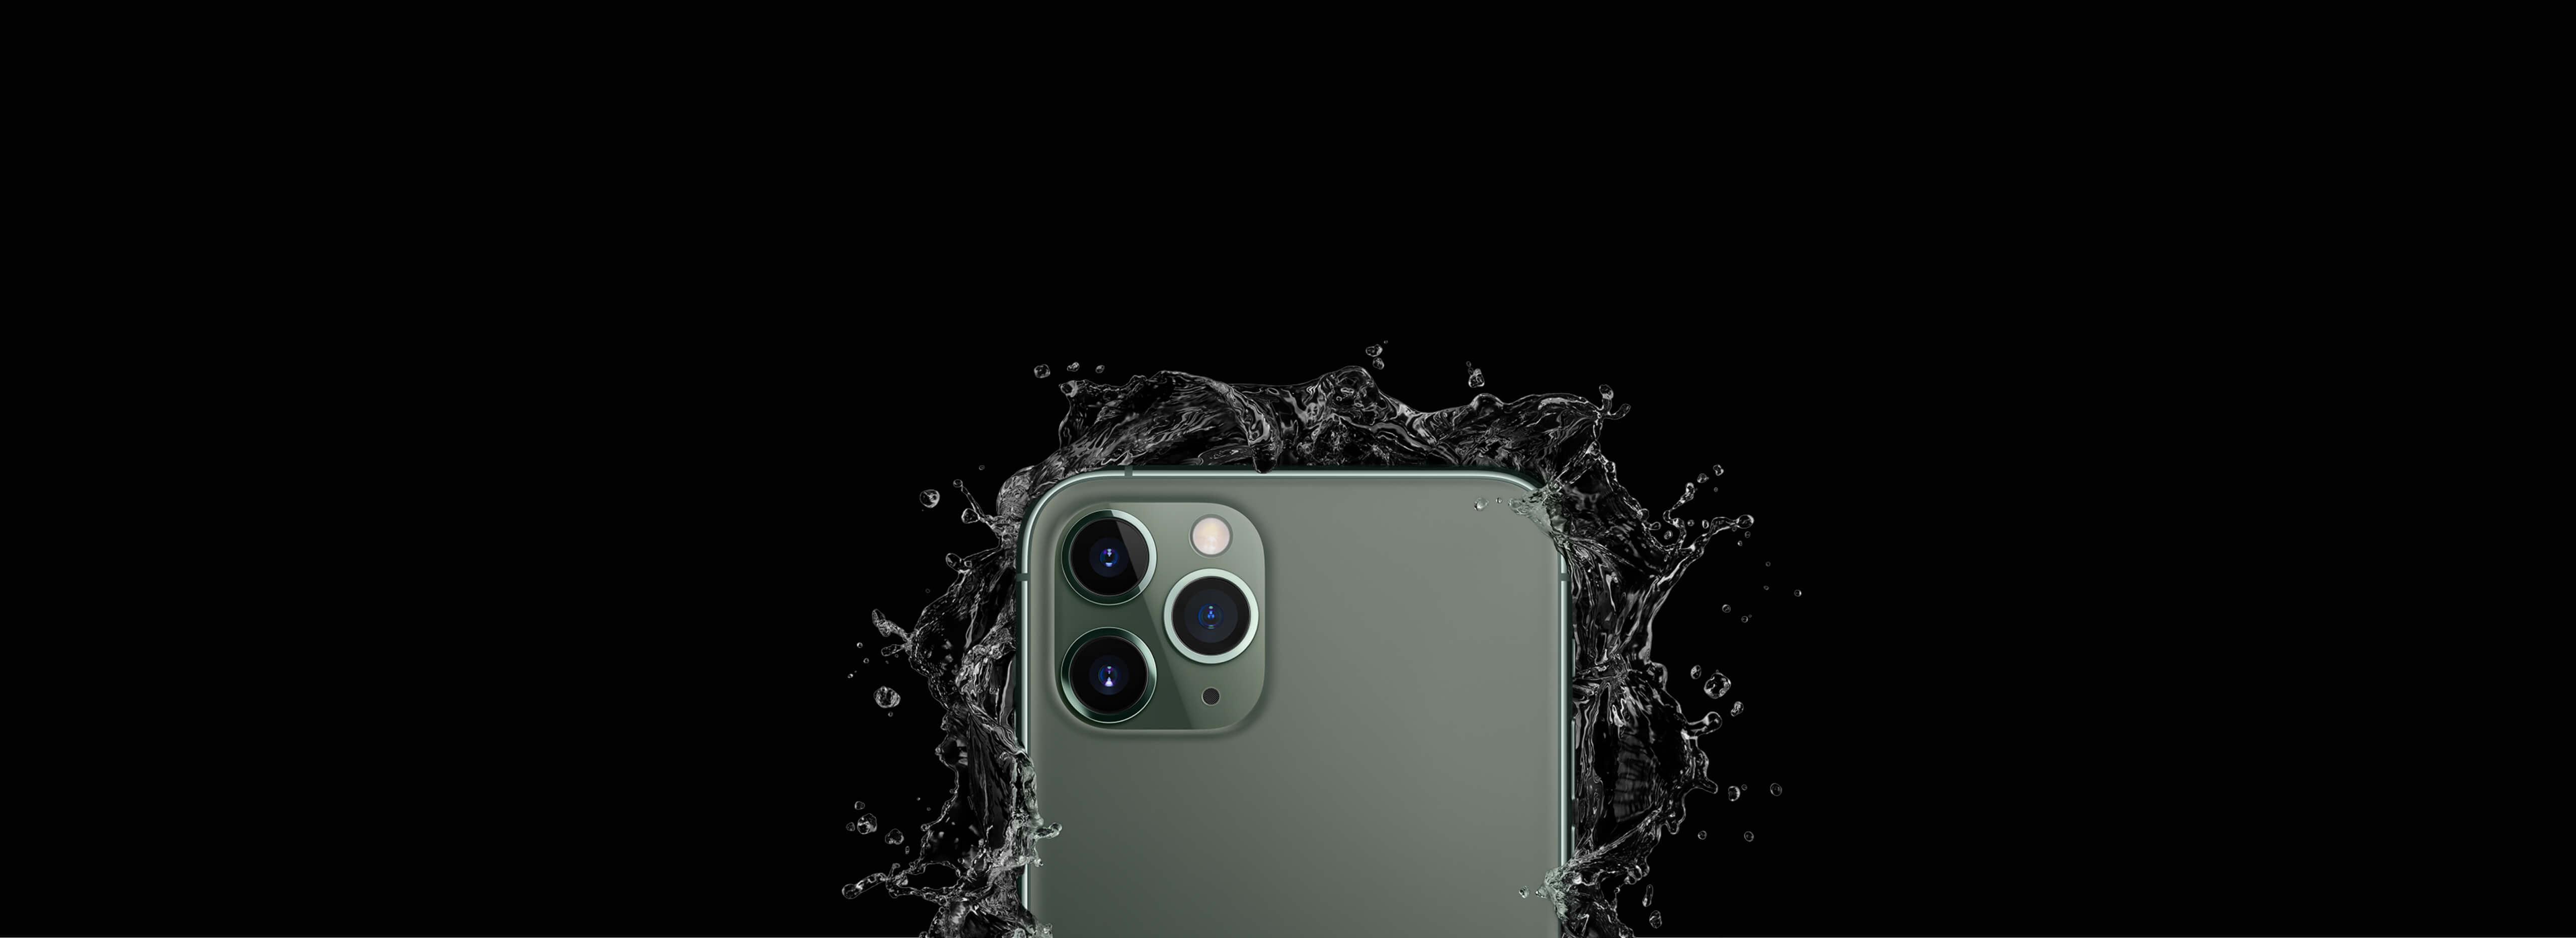 iPhone 11 Pro Main